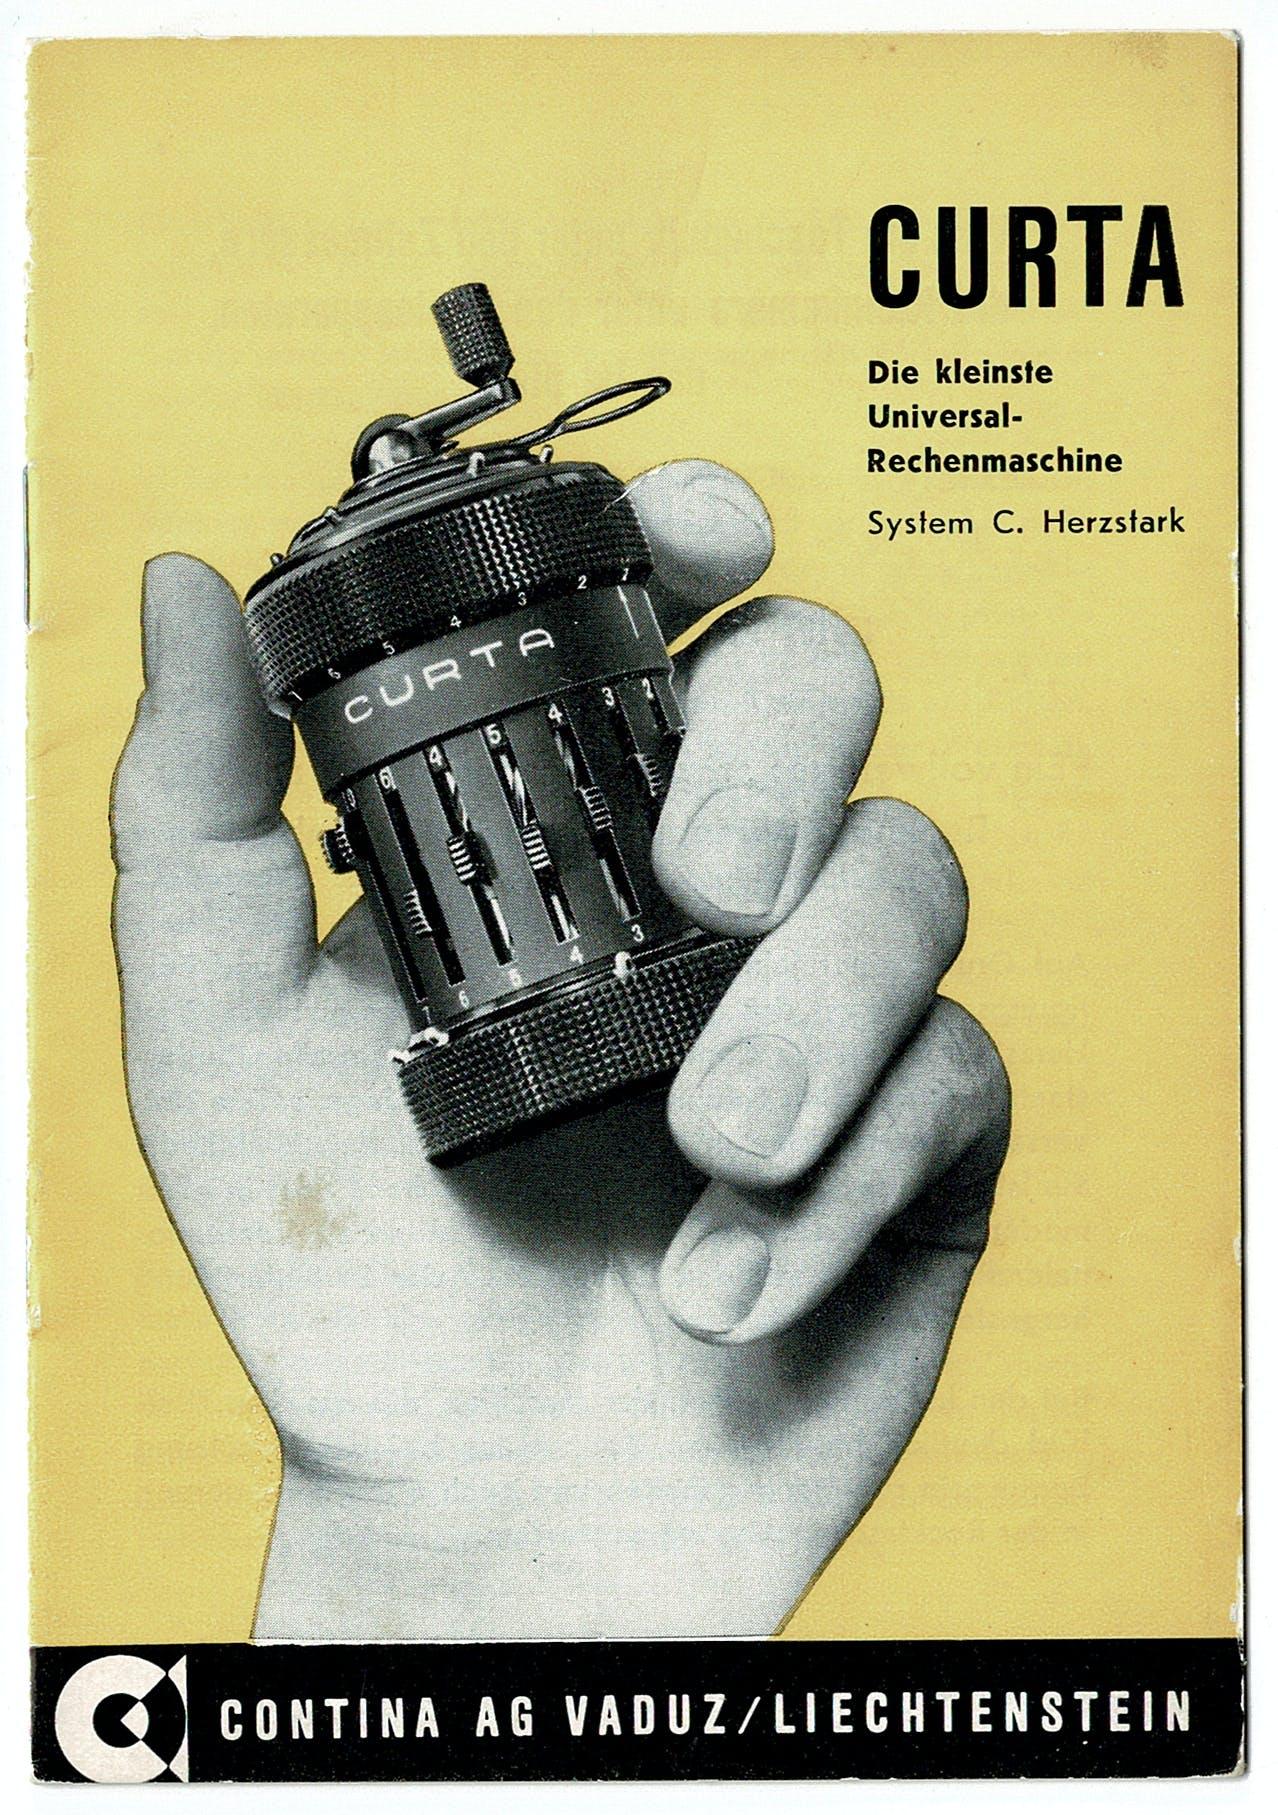 Curta Broschüre